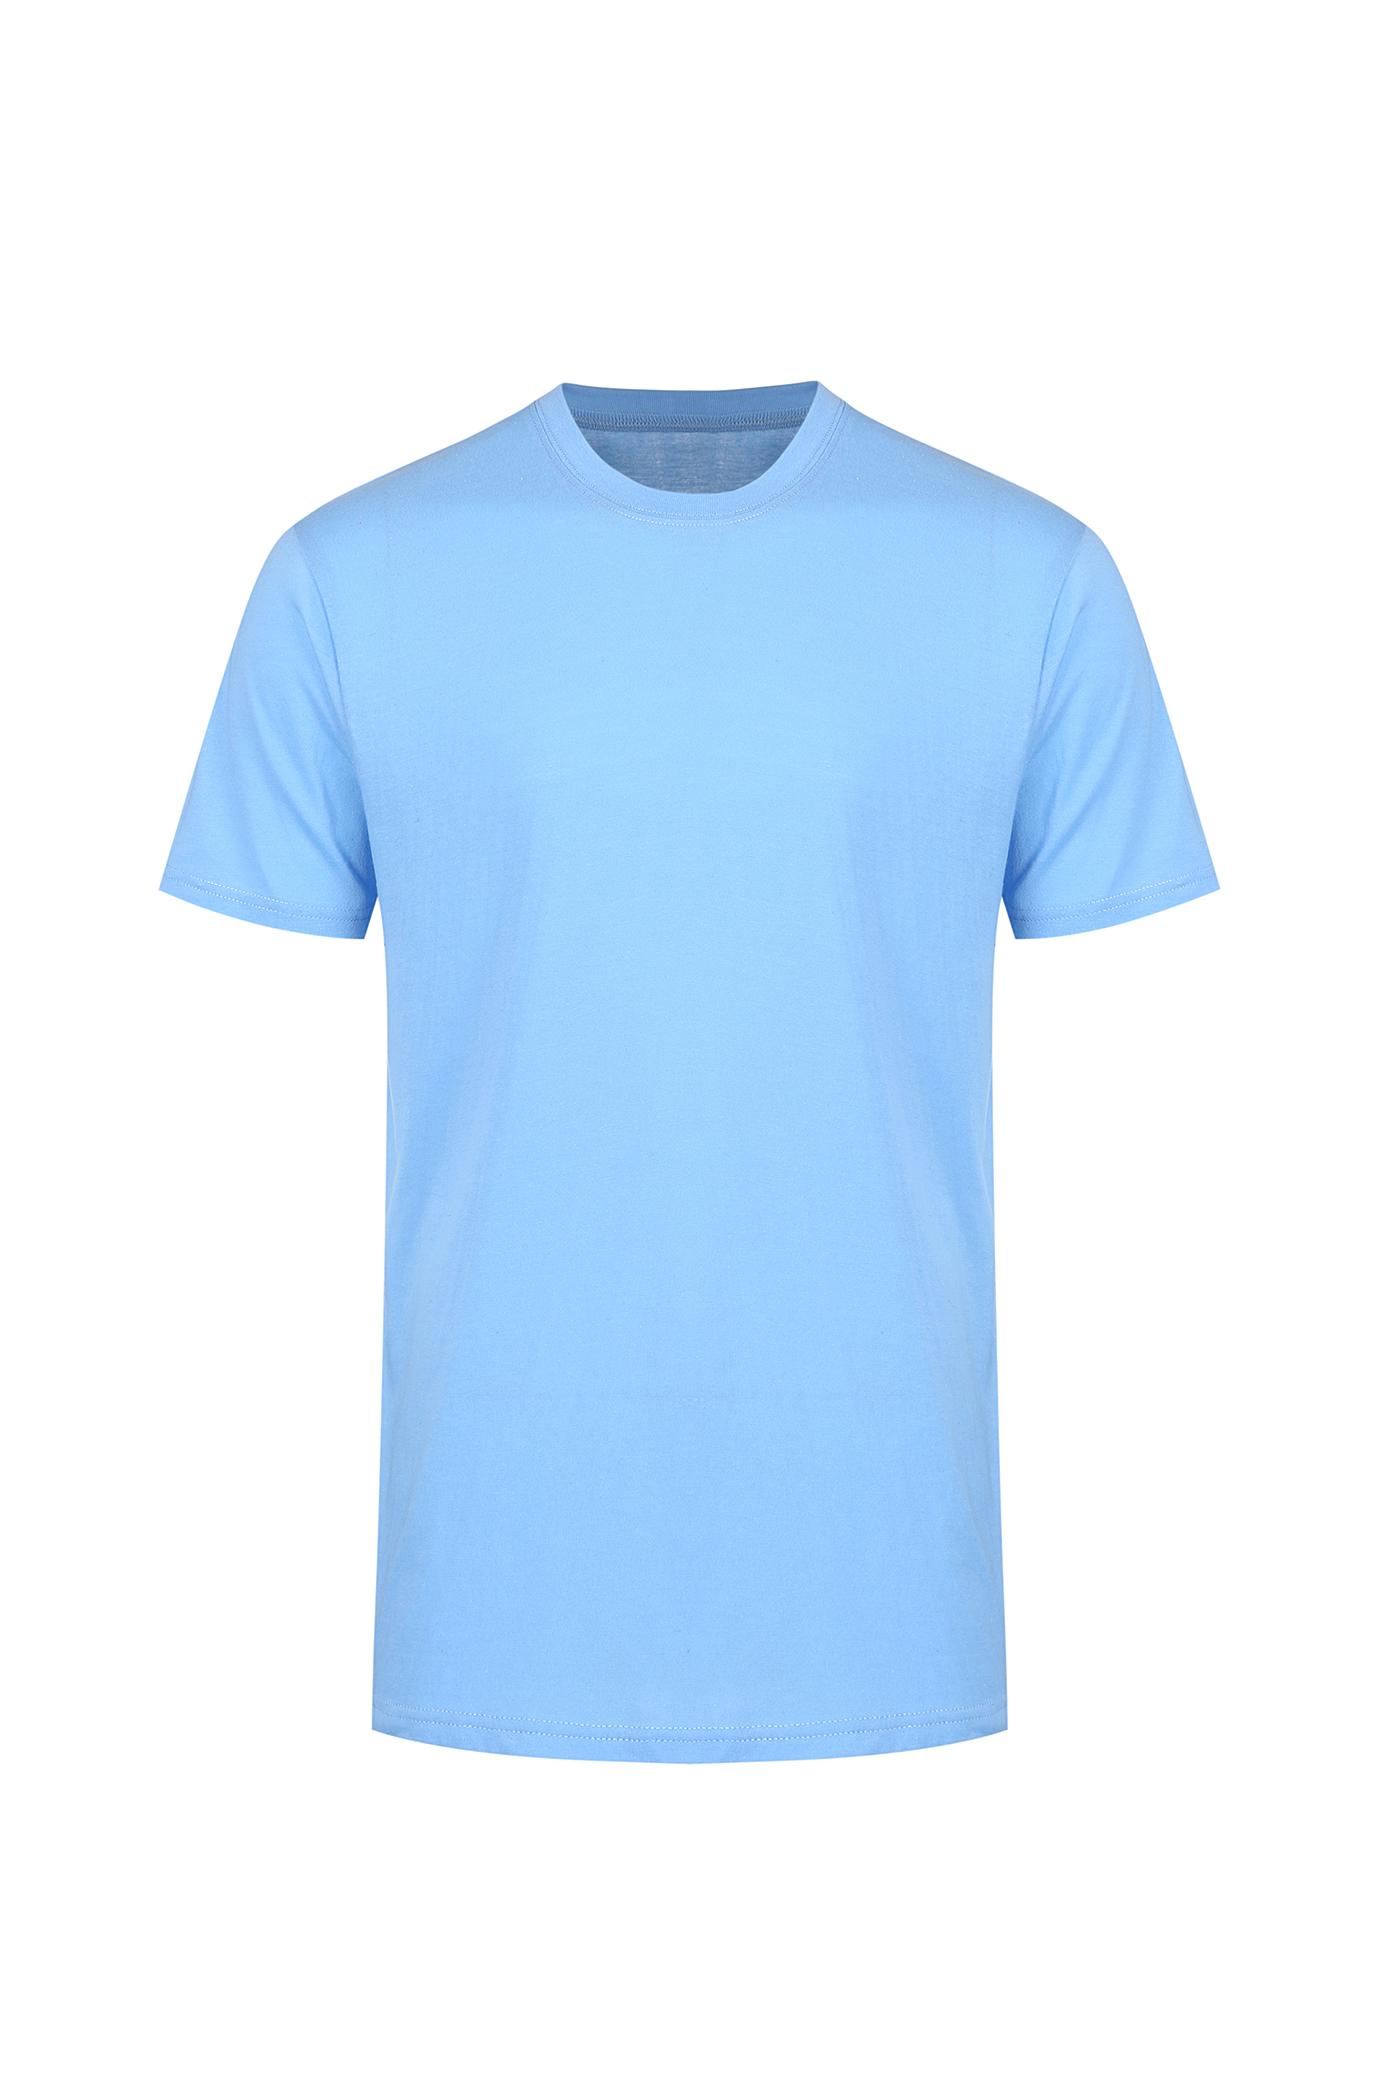 Zeefdruk T-shirt, Blanco T-shirt Geen Label